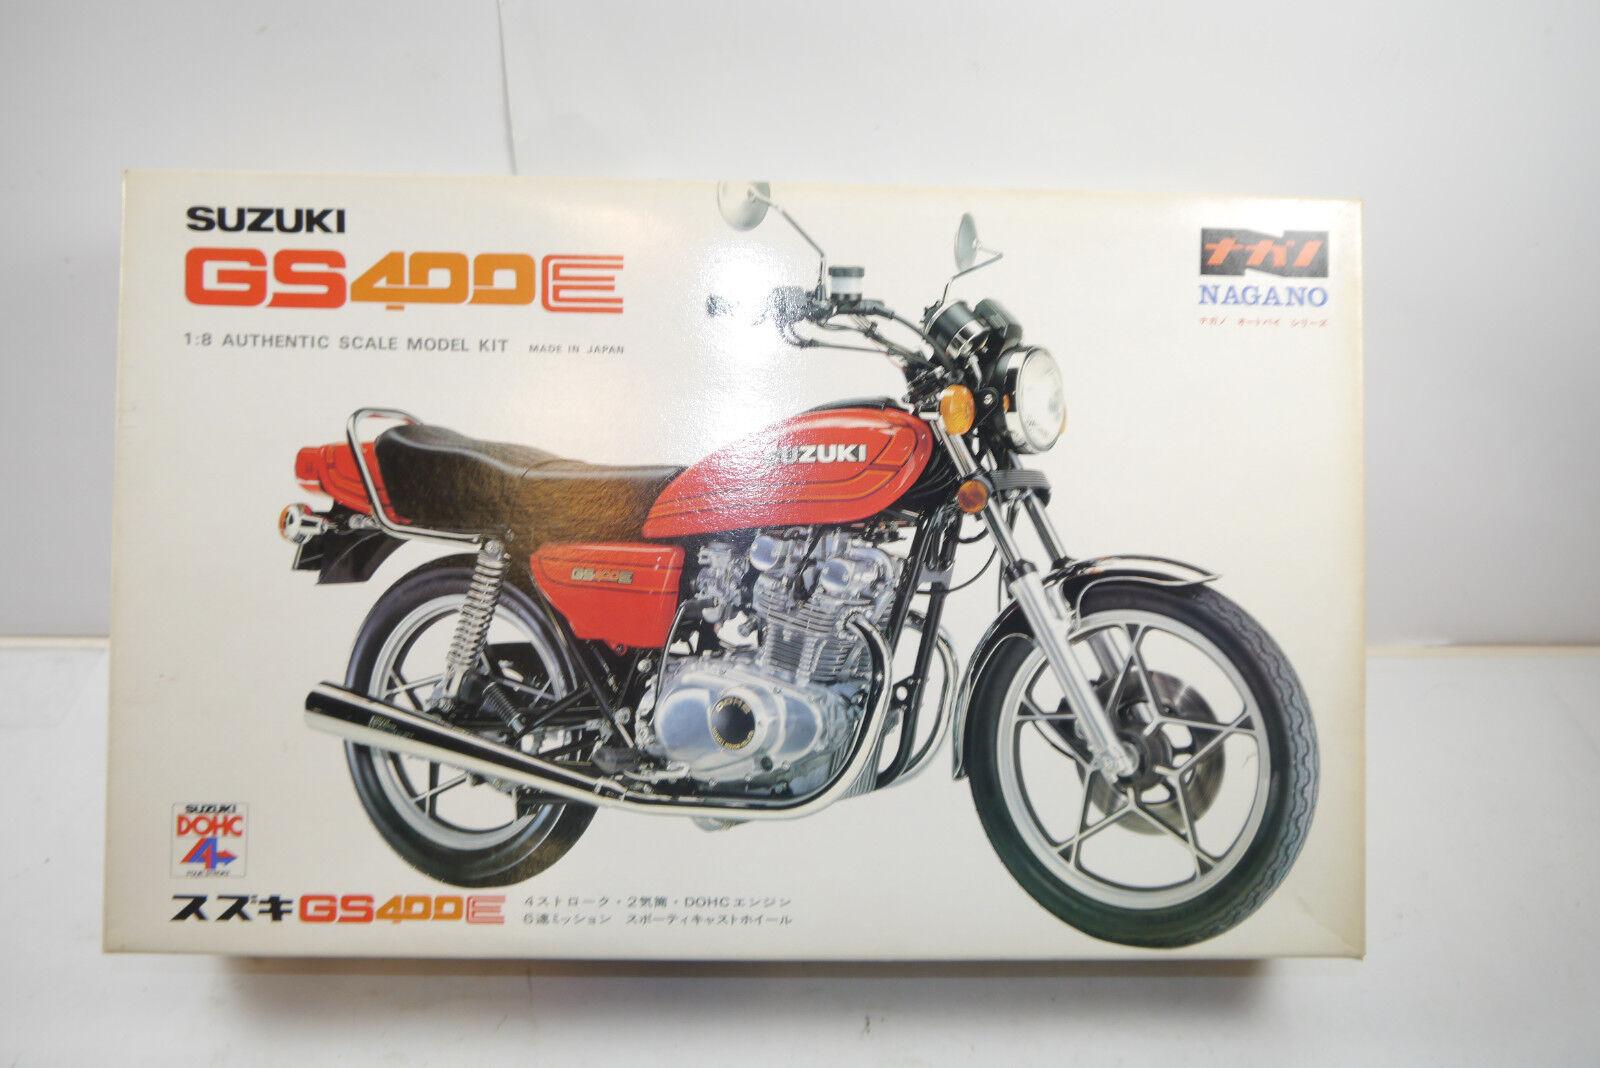 Nagano Suzuki Gs400e Motorbike Plastic Model Building Set 1 8 (Mf6)